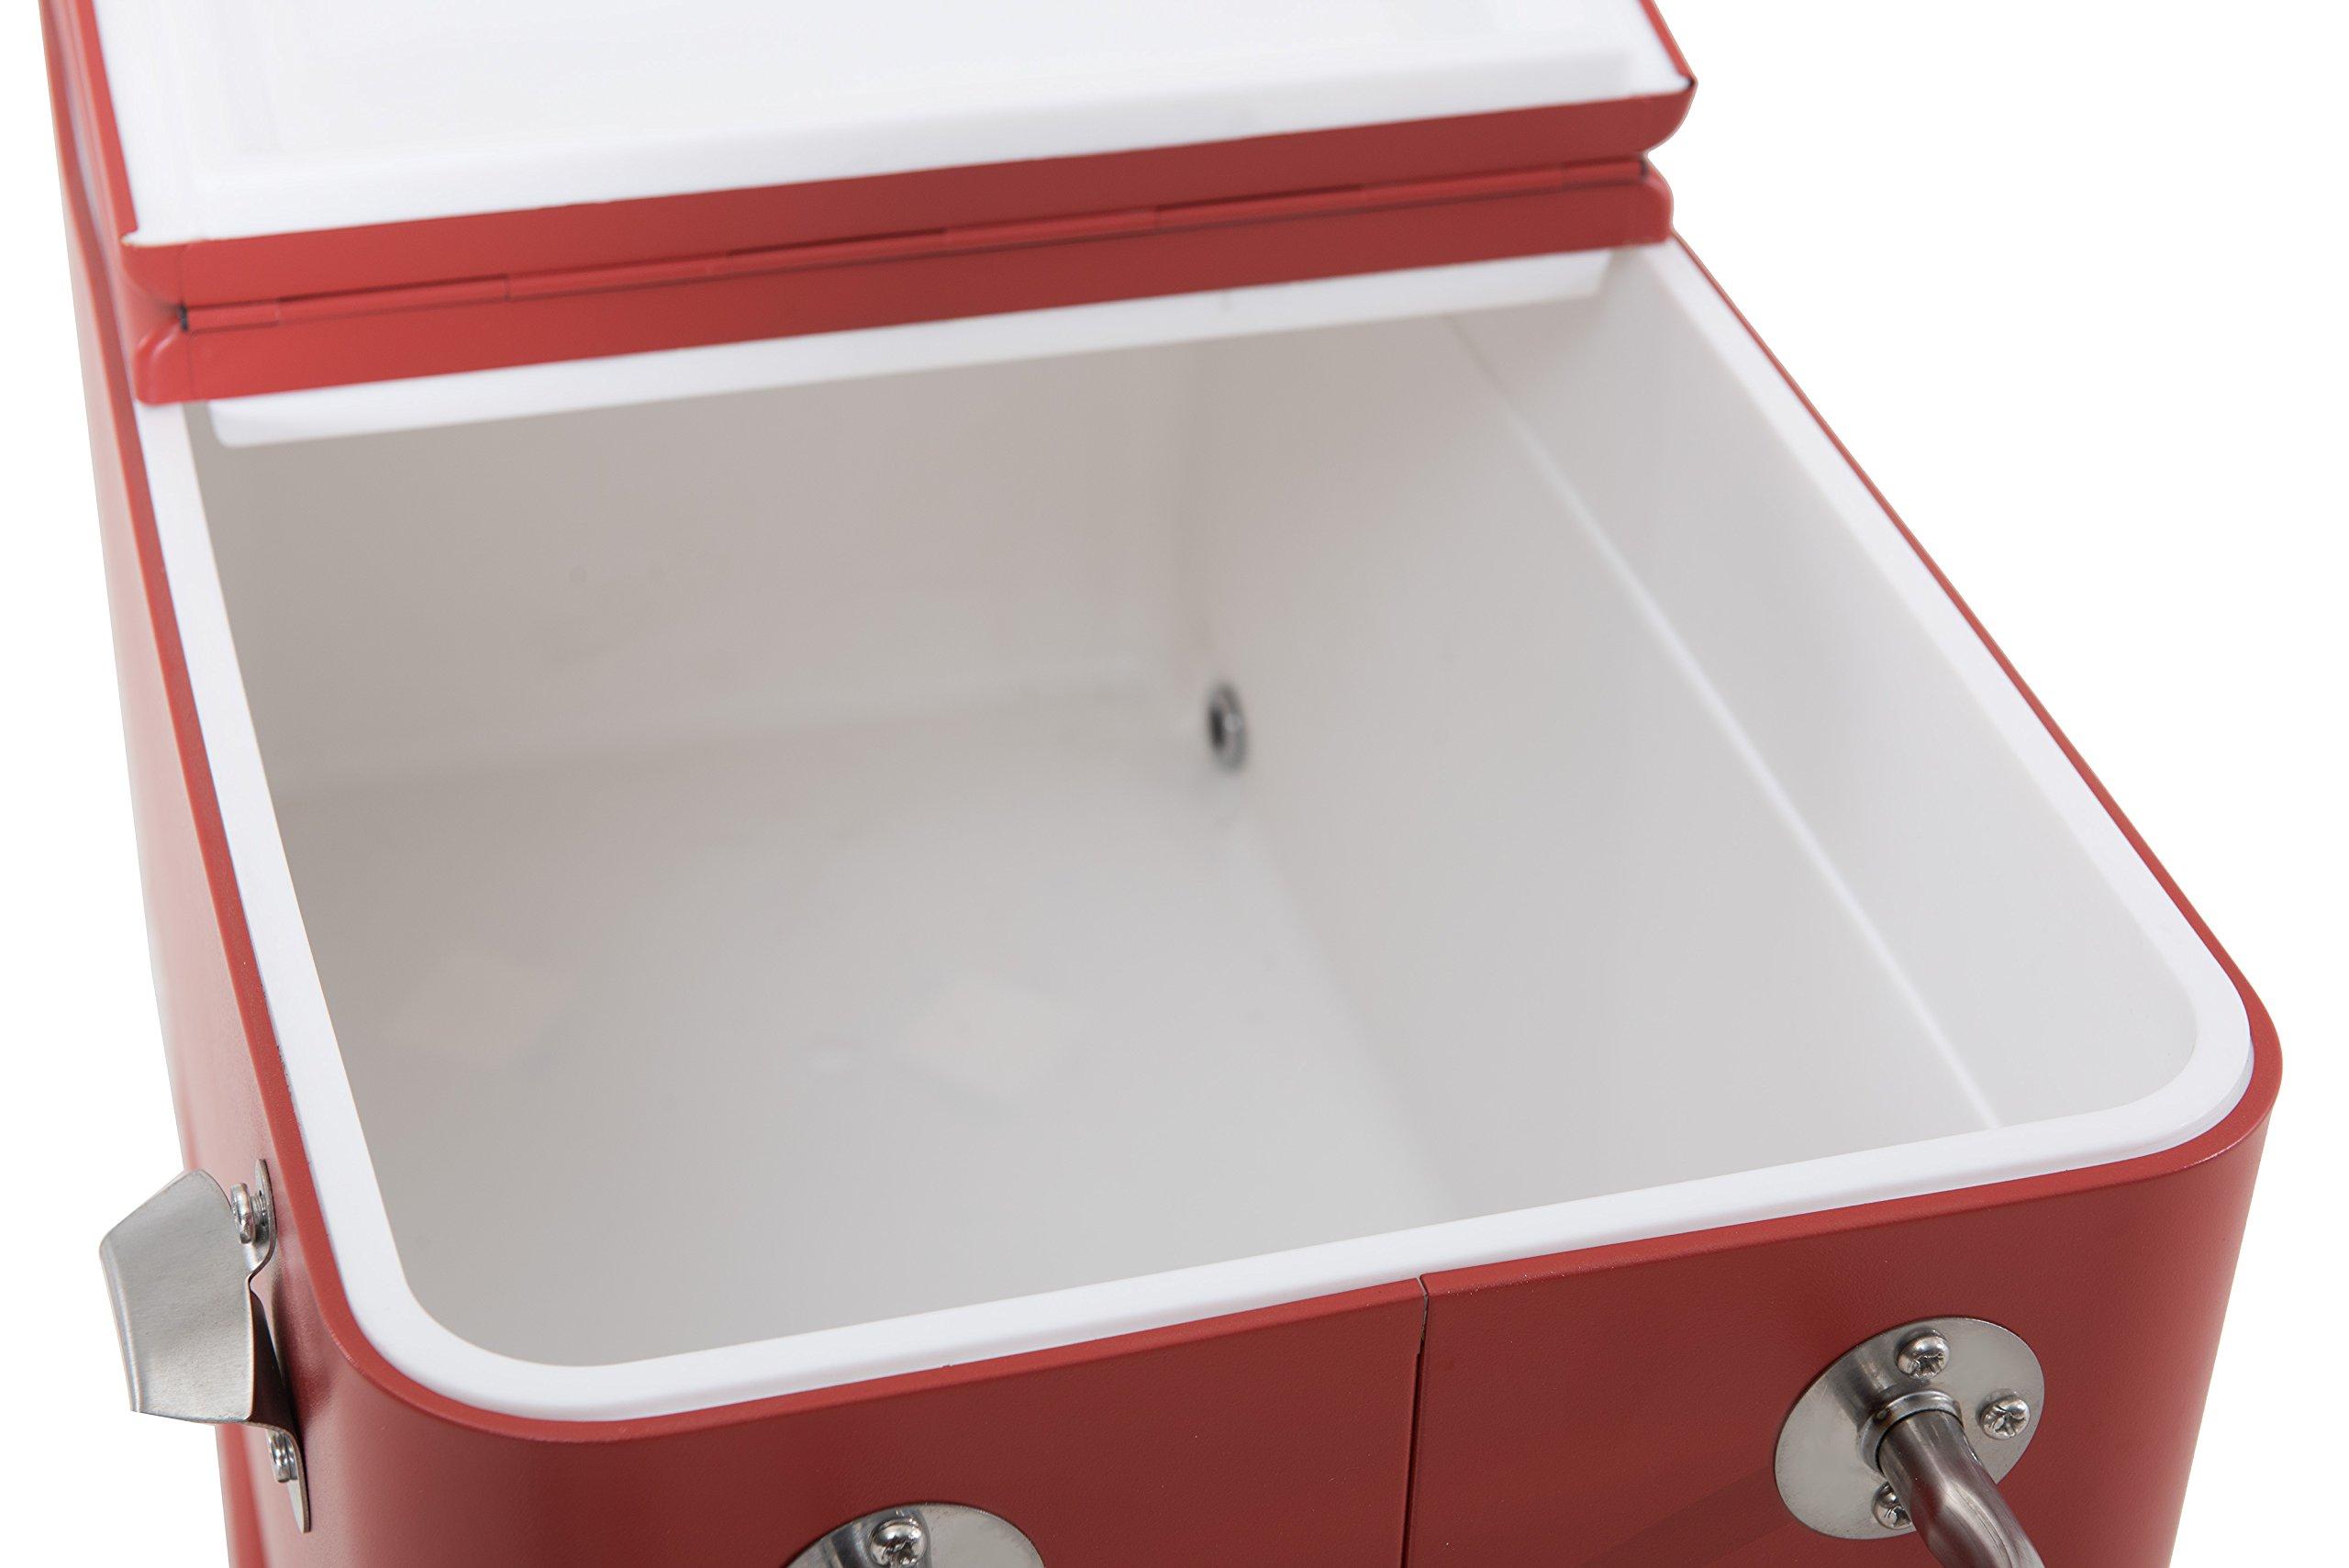 Sunjoy L-BC153PST 60 quart Wheeled Beverage Cooler in Red by sunjoy (Image #12)